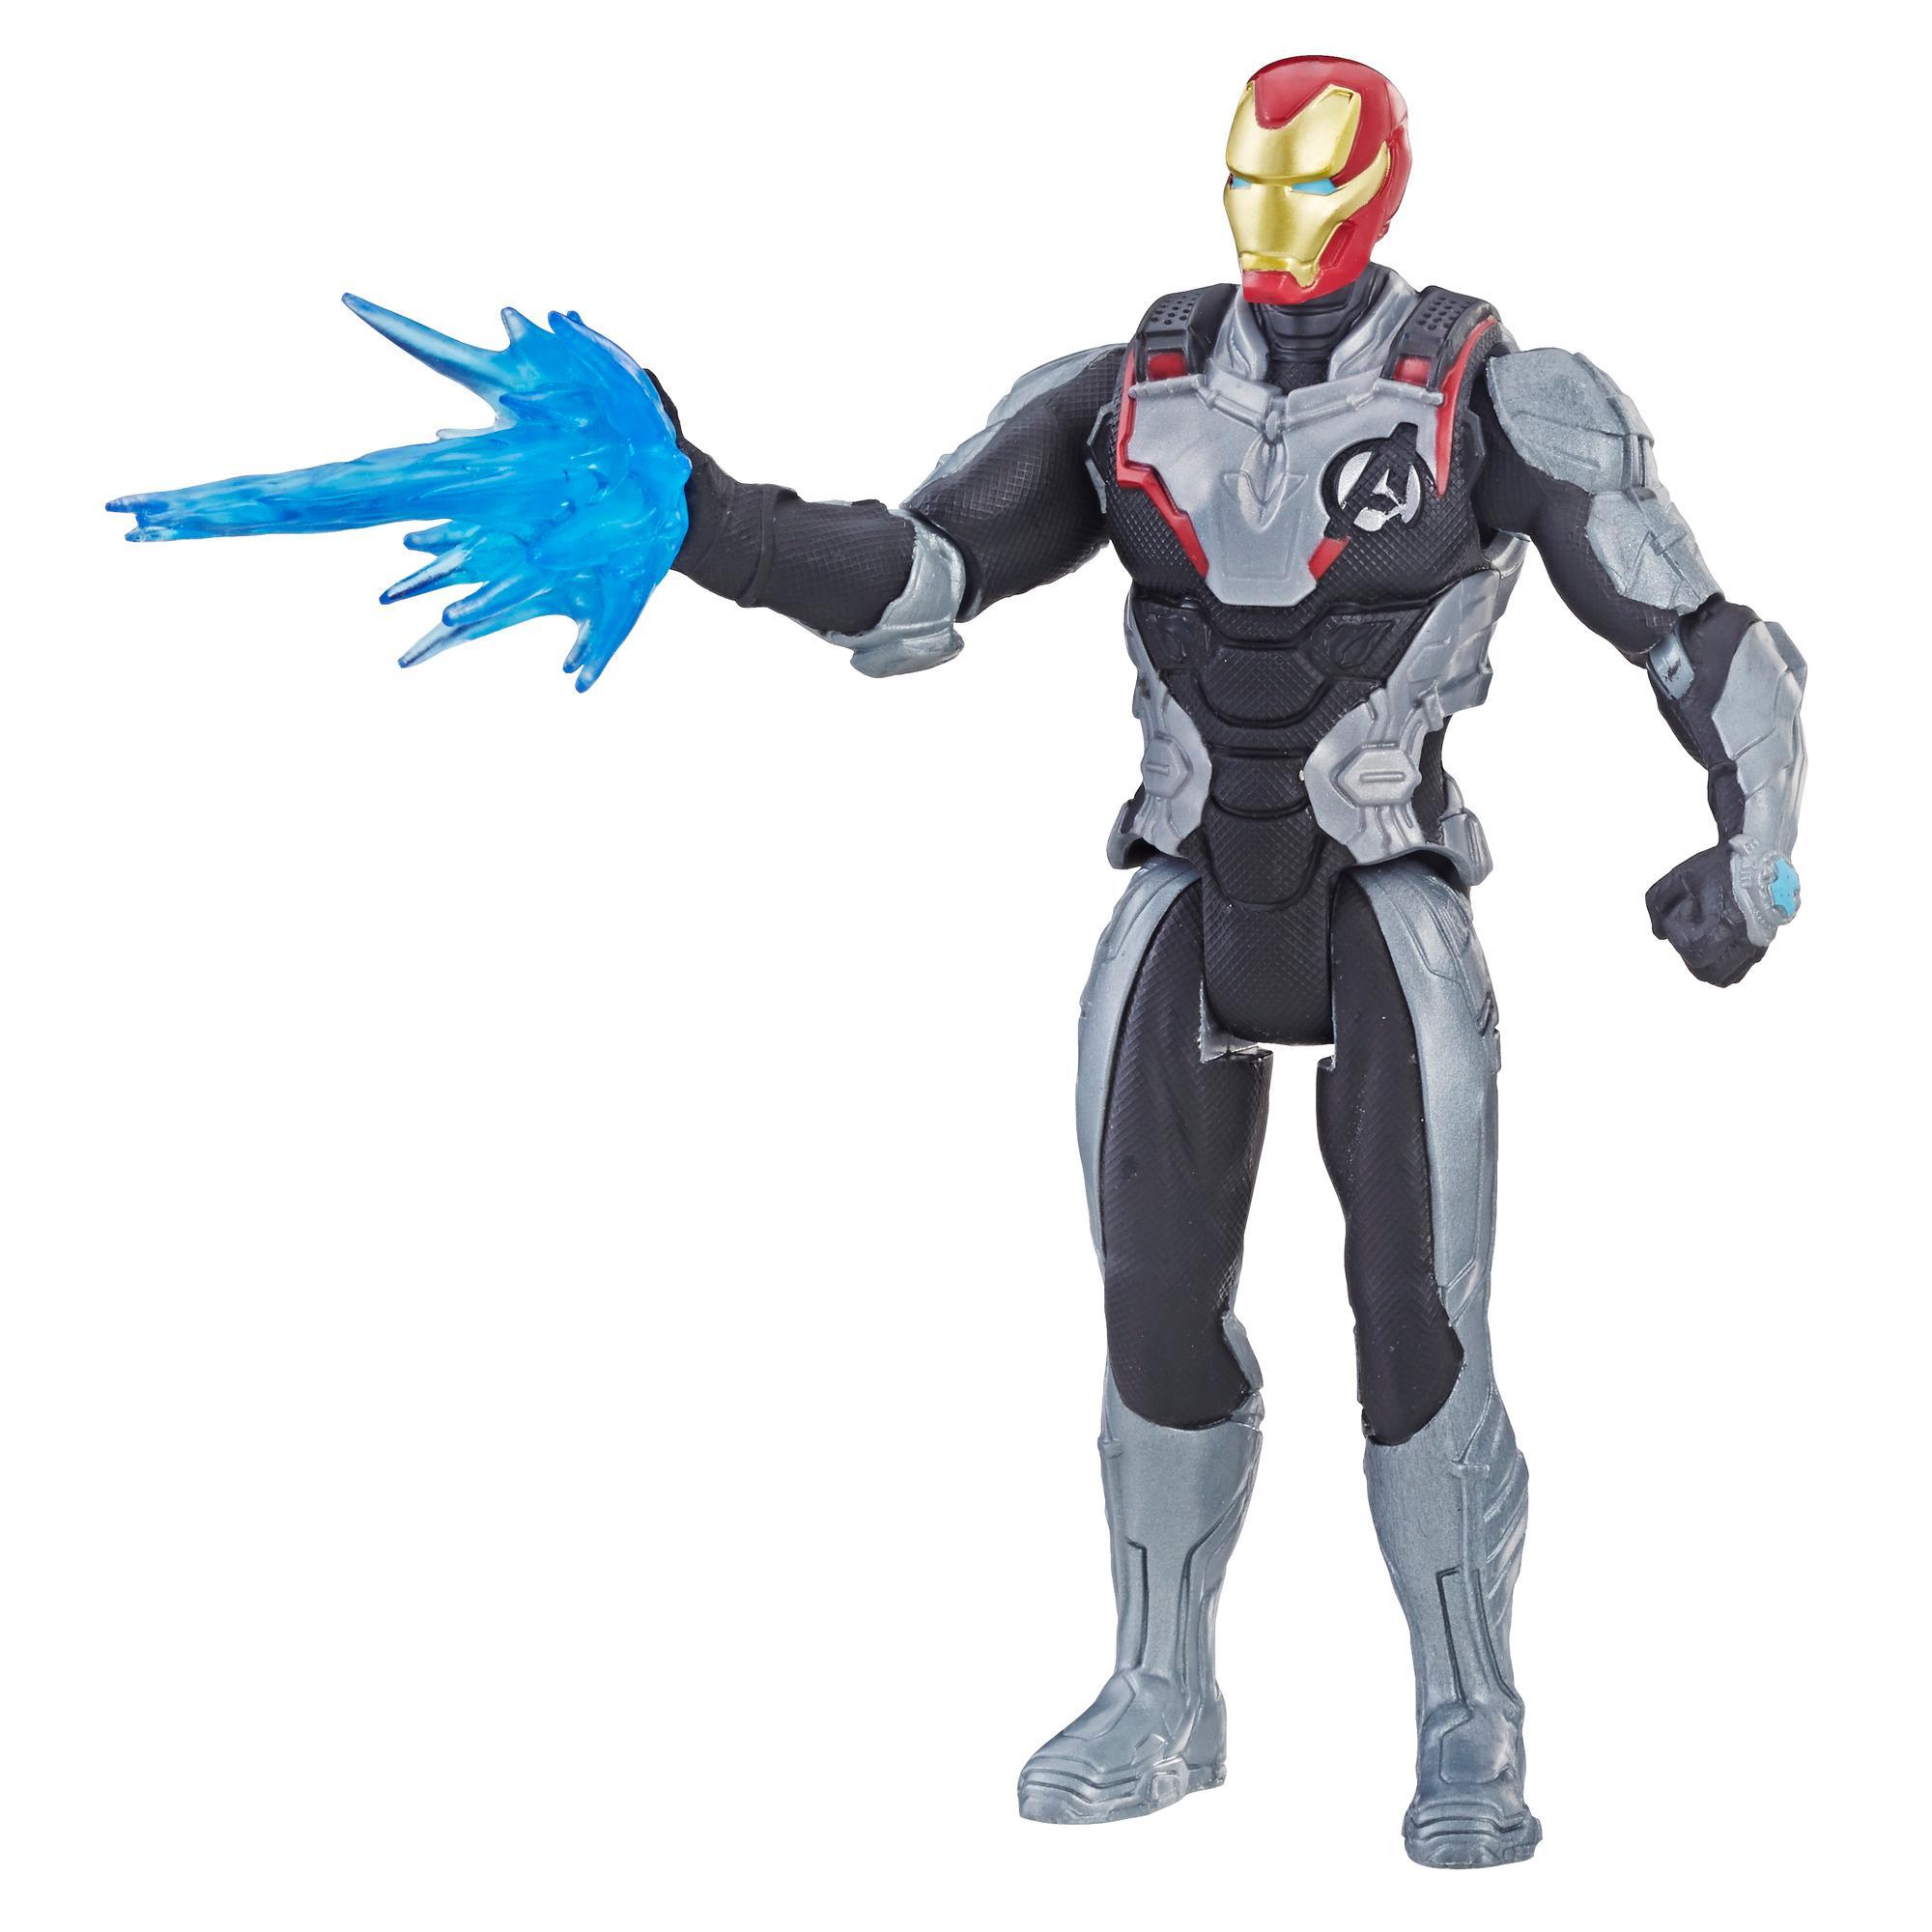 Avengers Endgame 6 Inch Figur Iron-Man